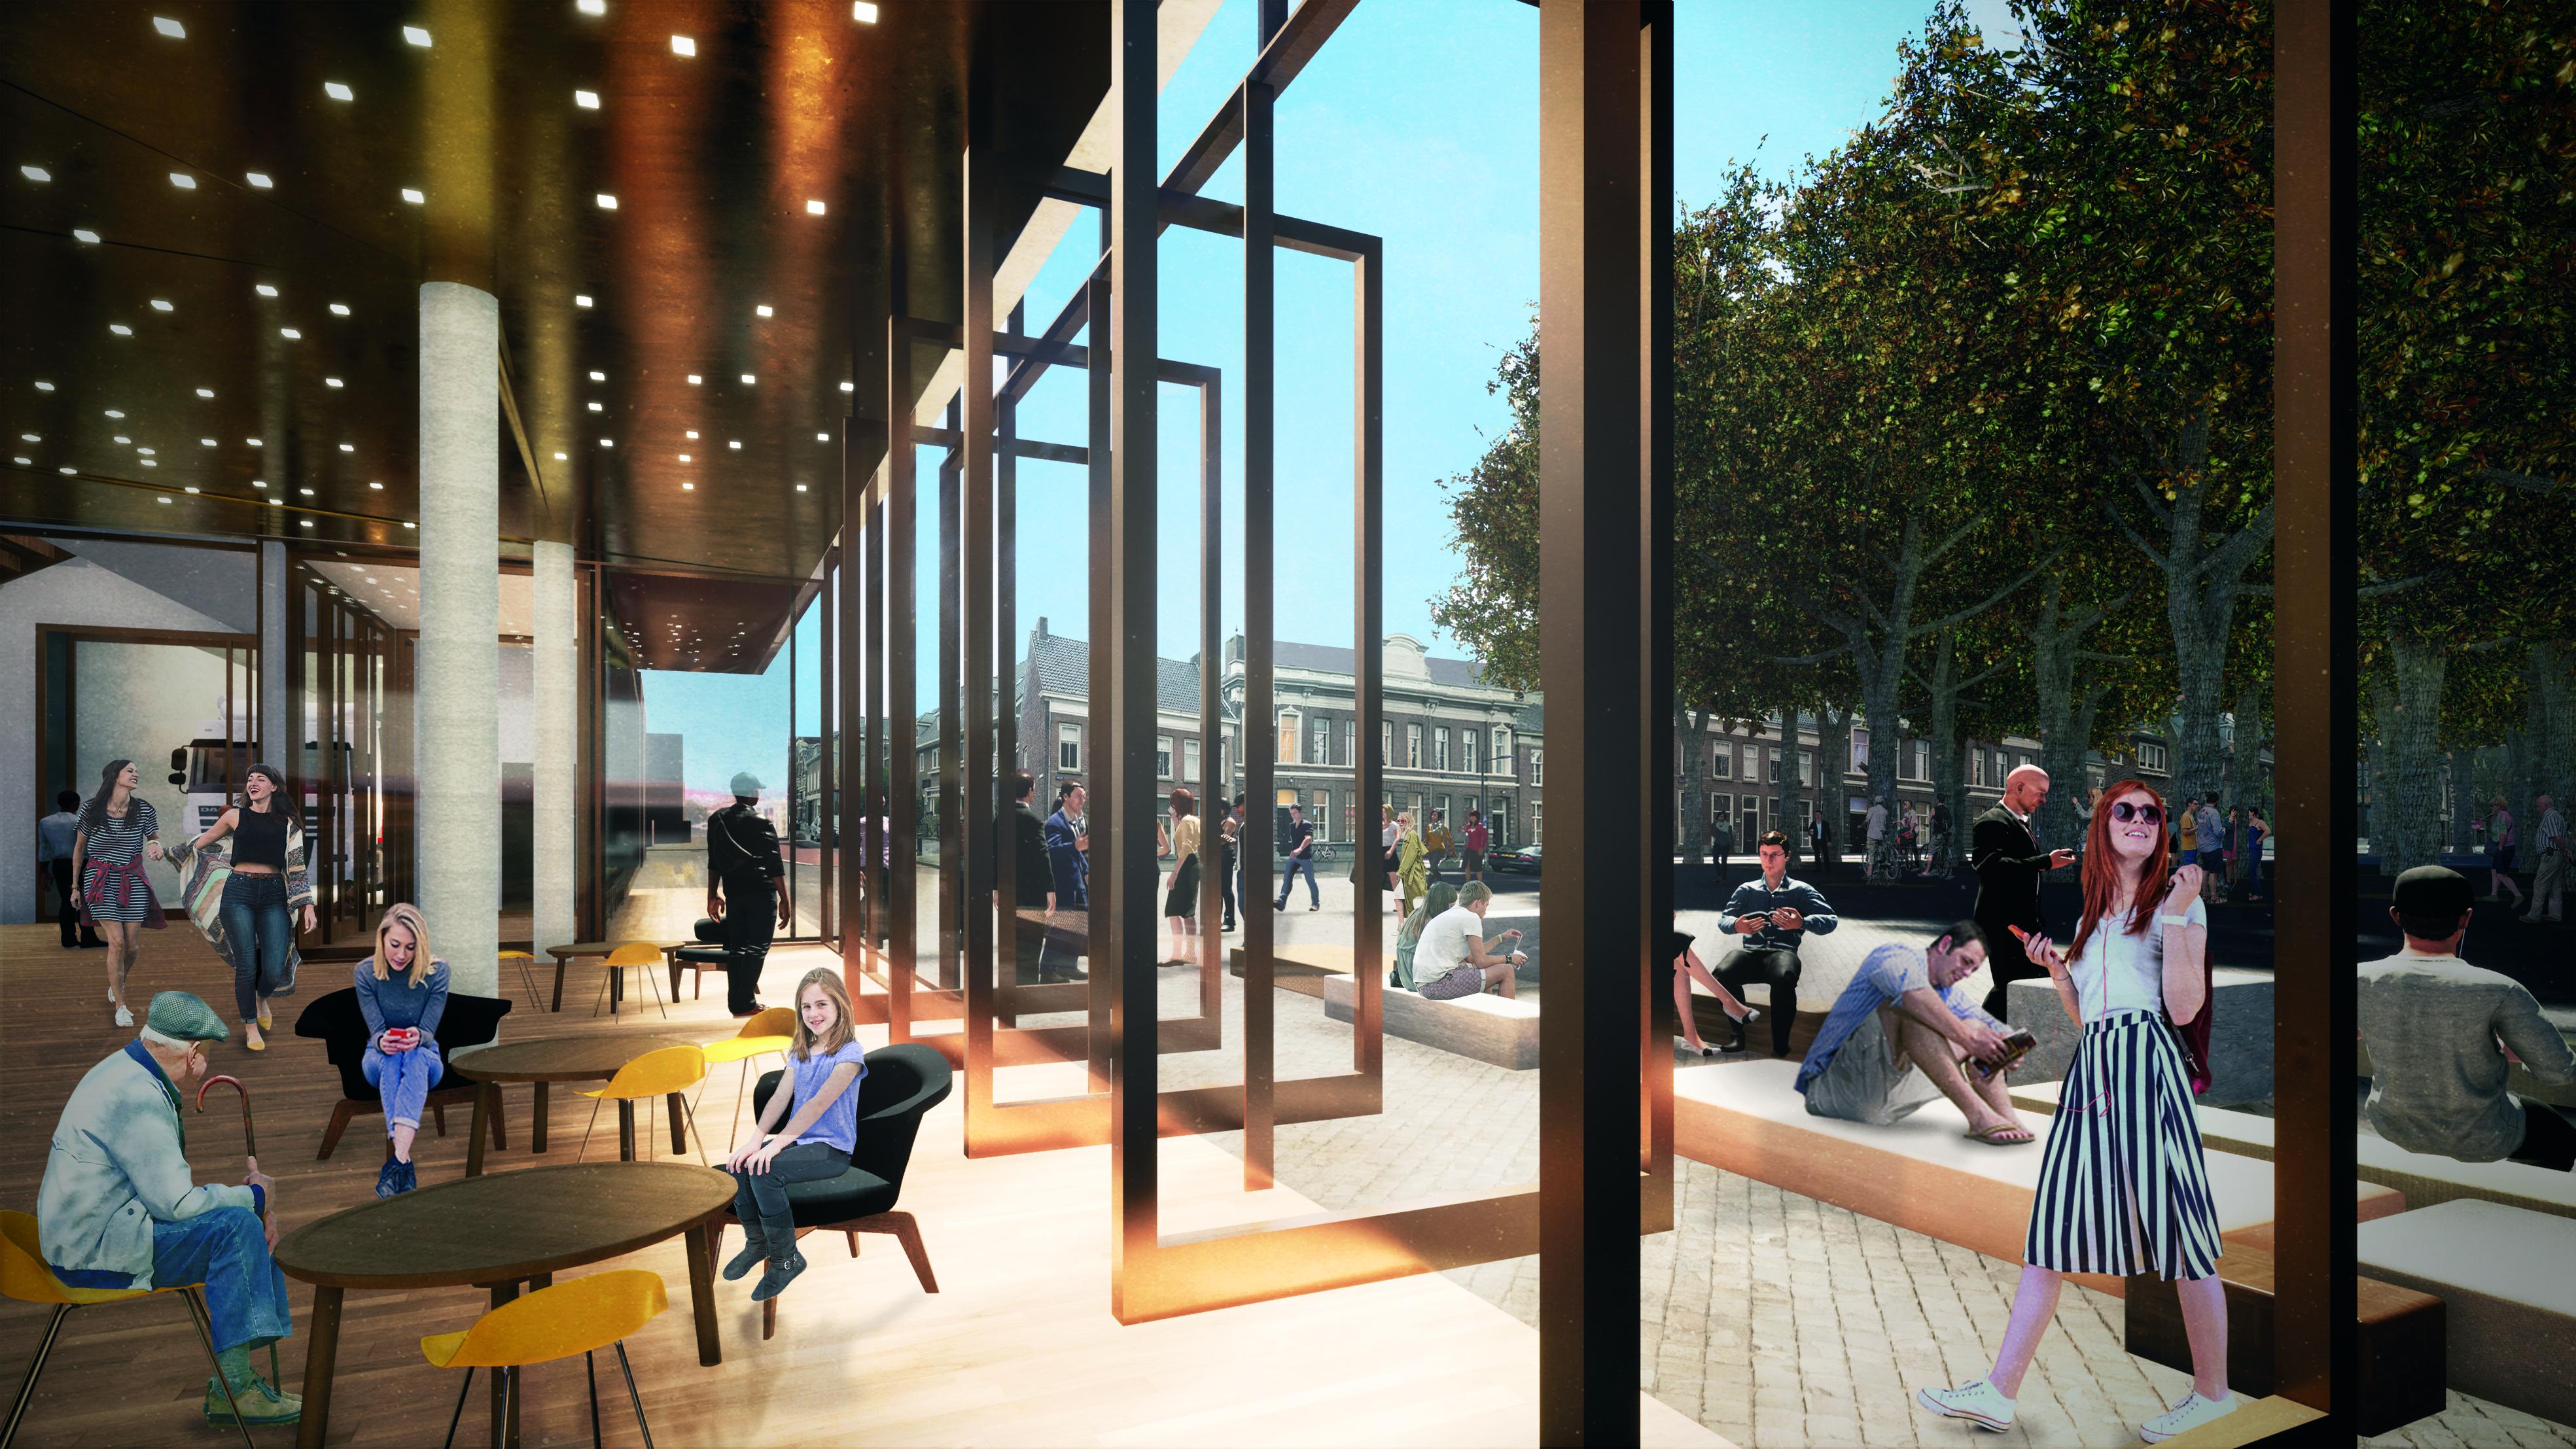 <p>Interieur cafe-entree. Theater aan de Parade door NOAHH   Network Oriented Architecture</p>